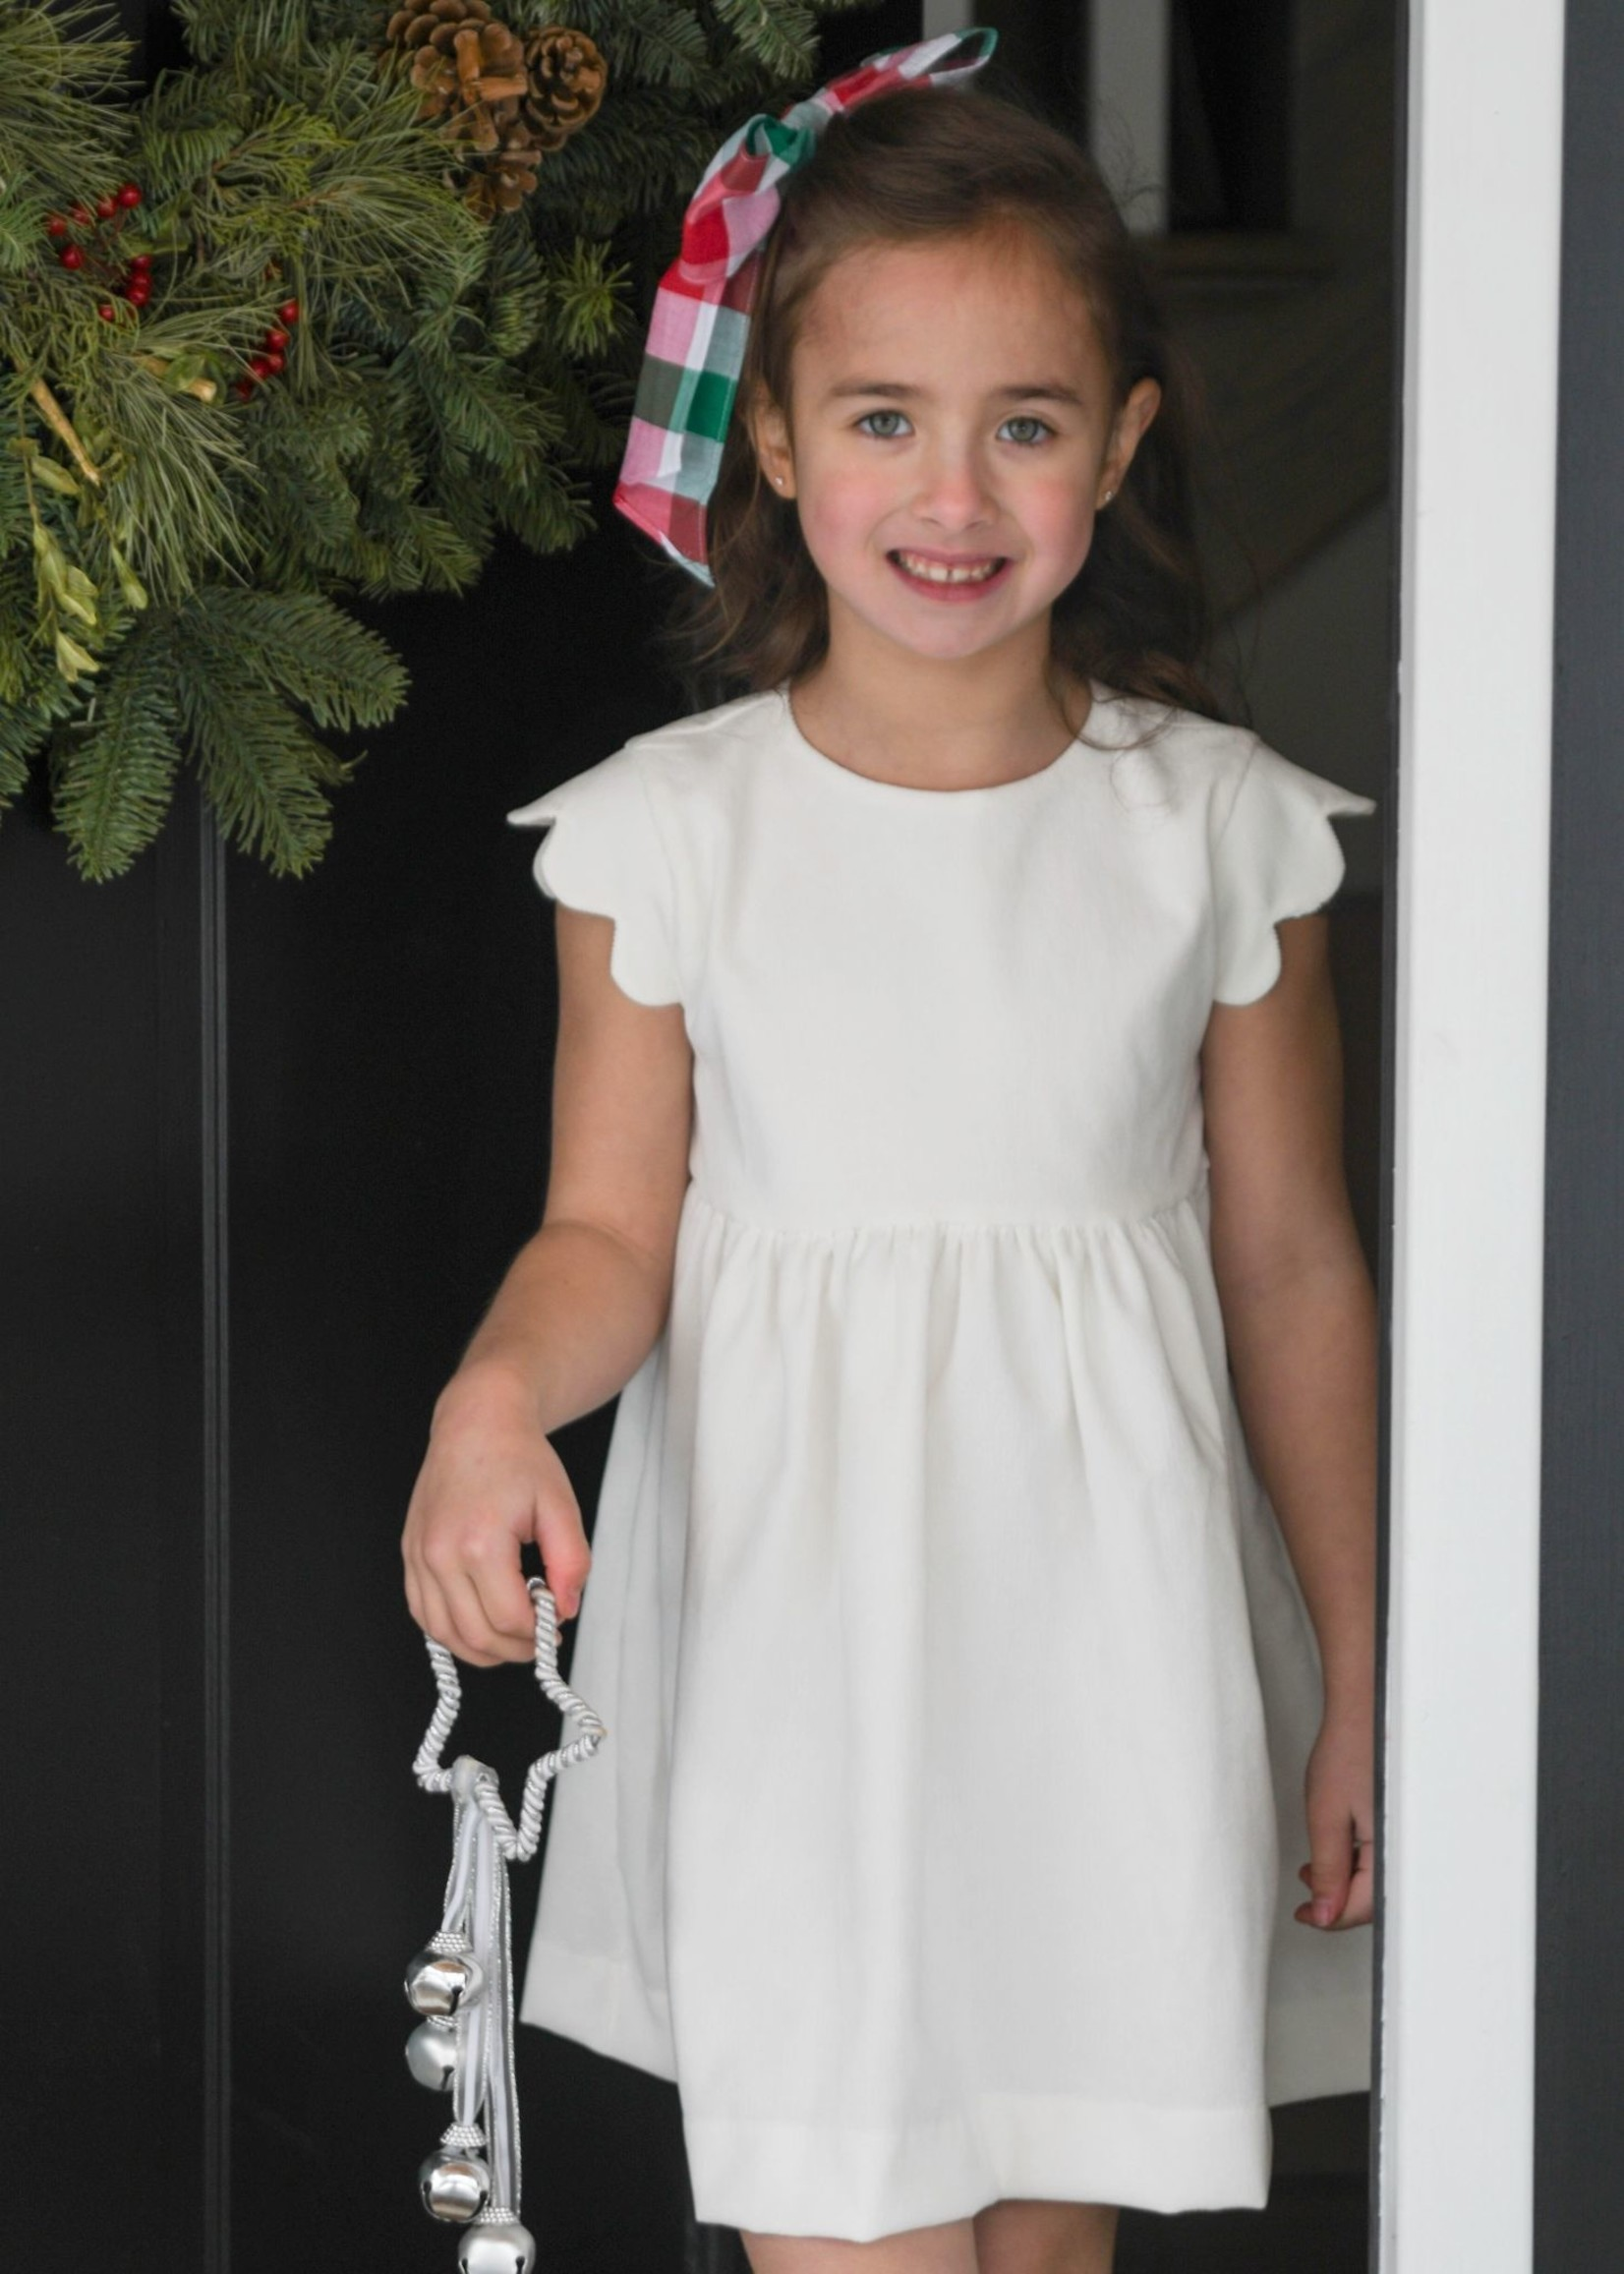 james and lottie Christmas Plaid Sadie Scalloped Sleeve Dress